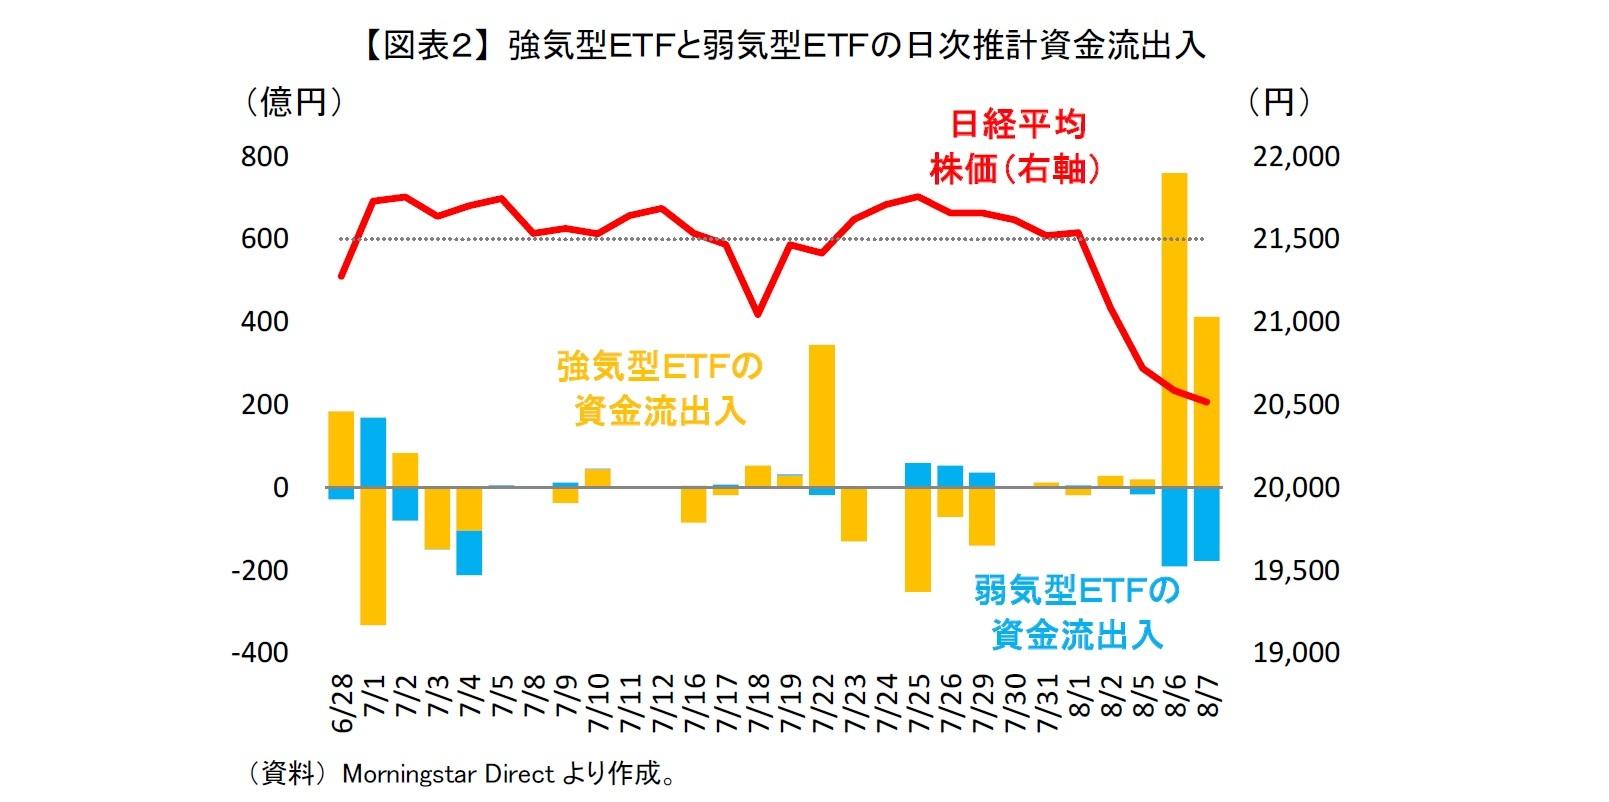 【図表2】 強気型ETFと弱気型ETFの日次推計資金流出入